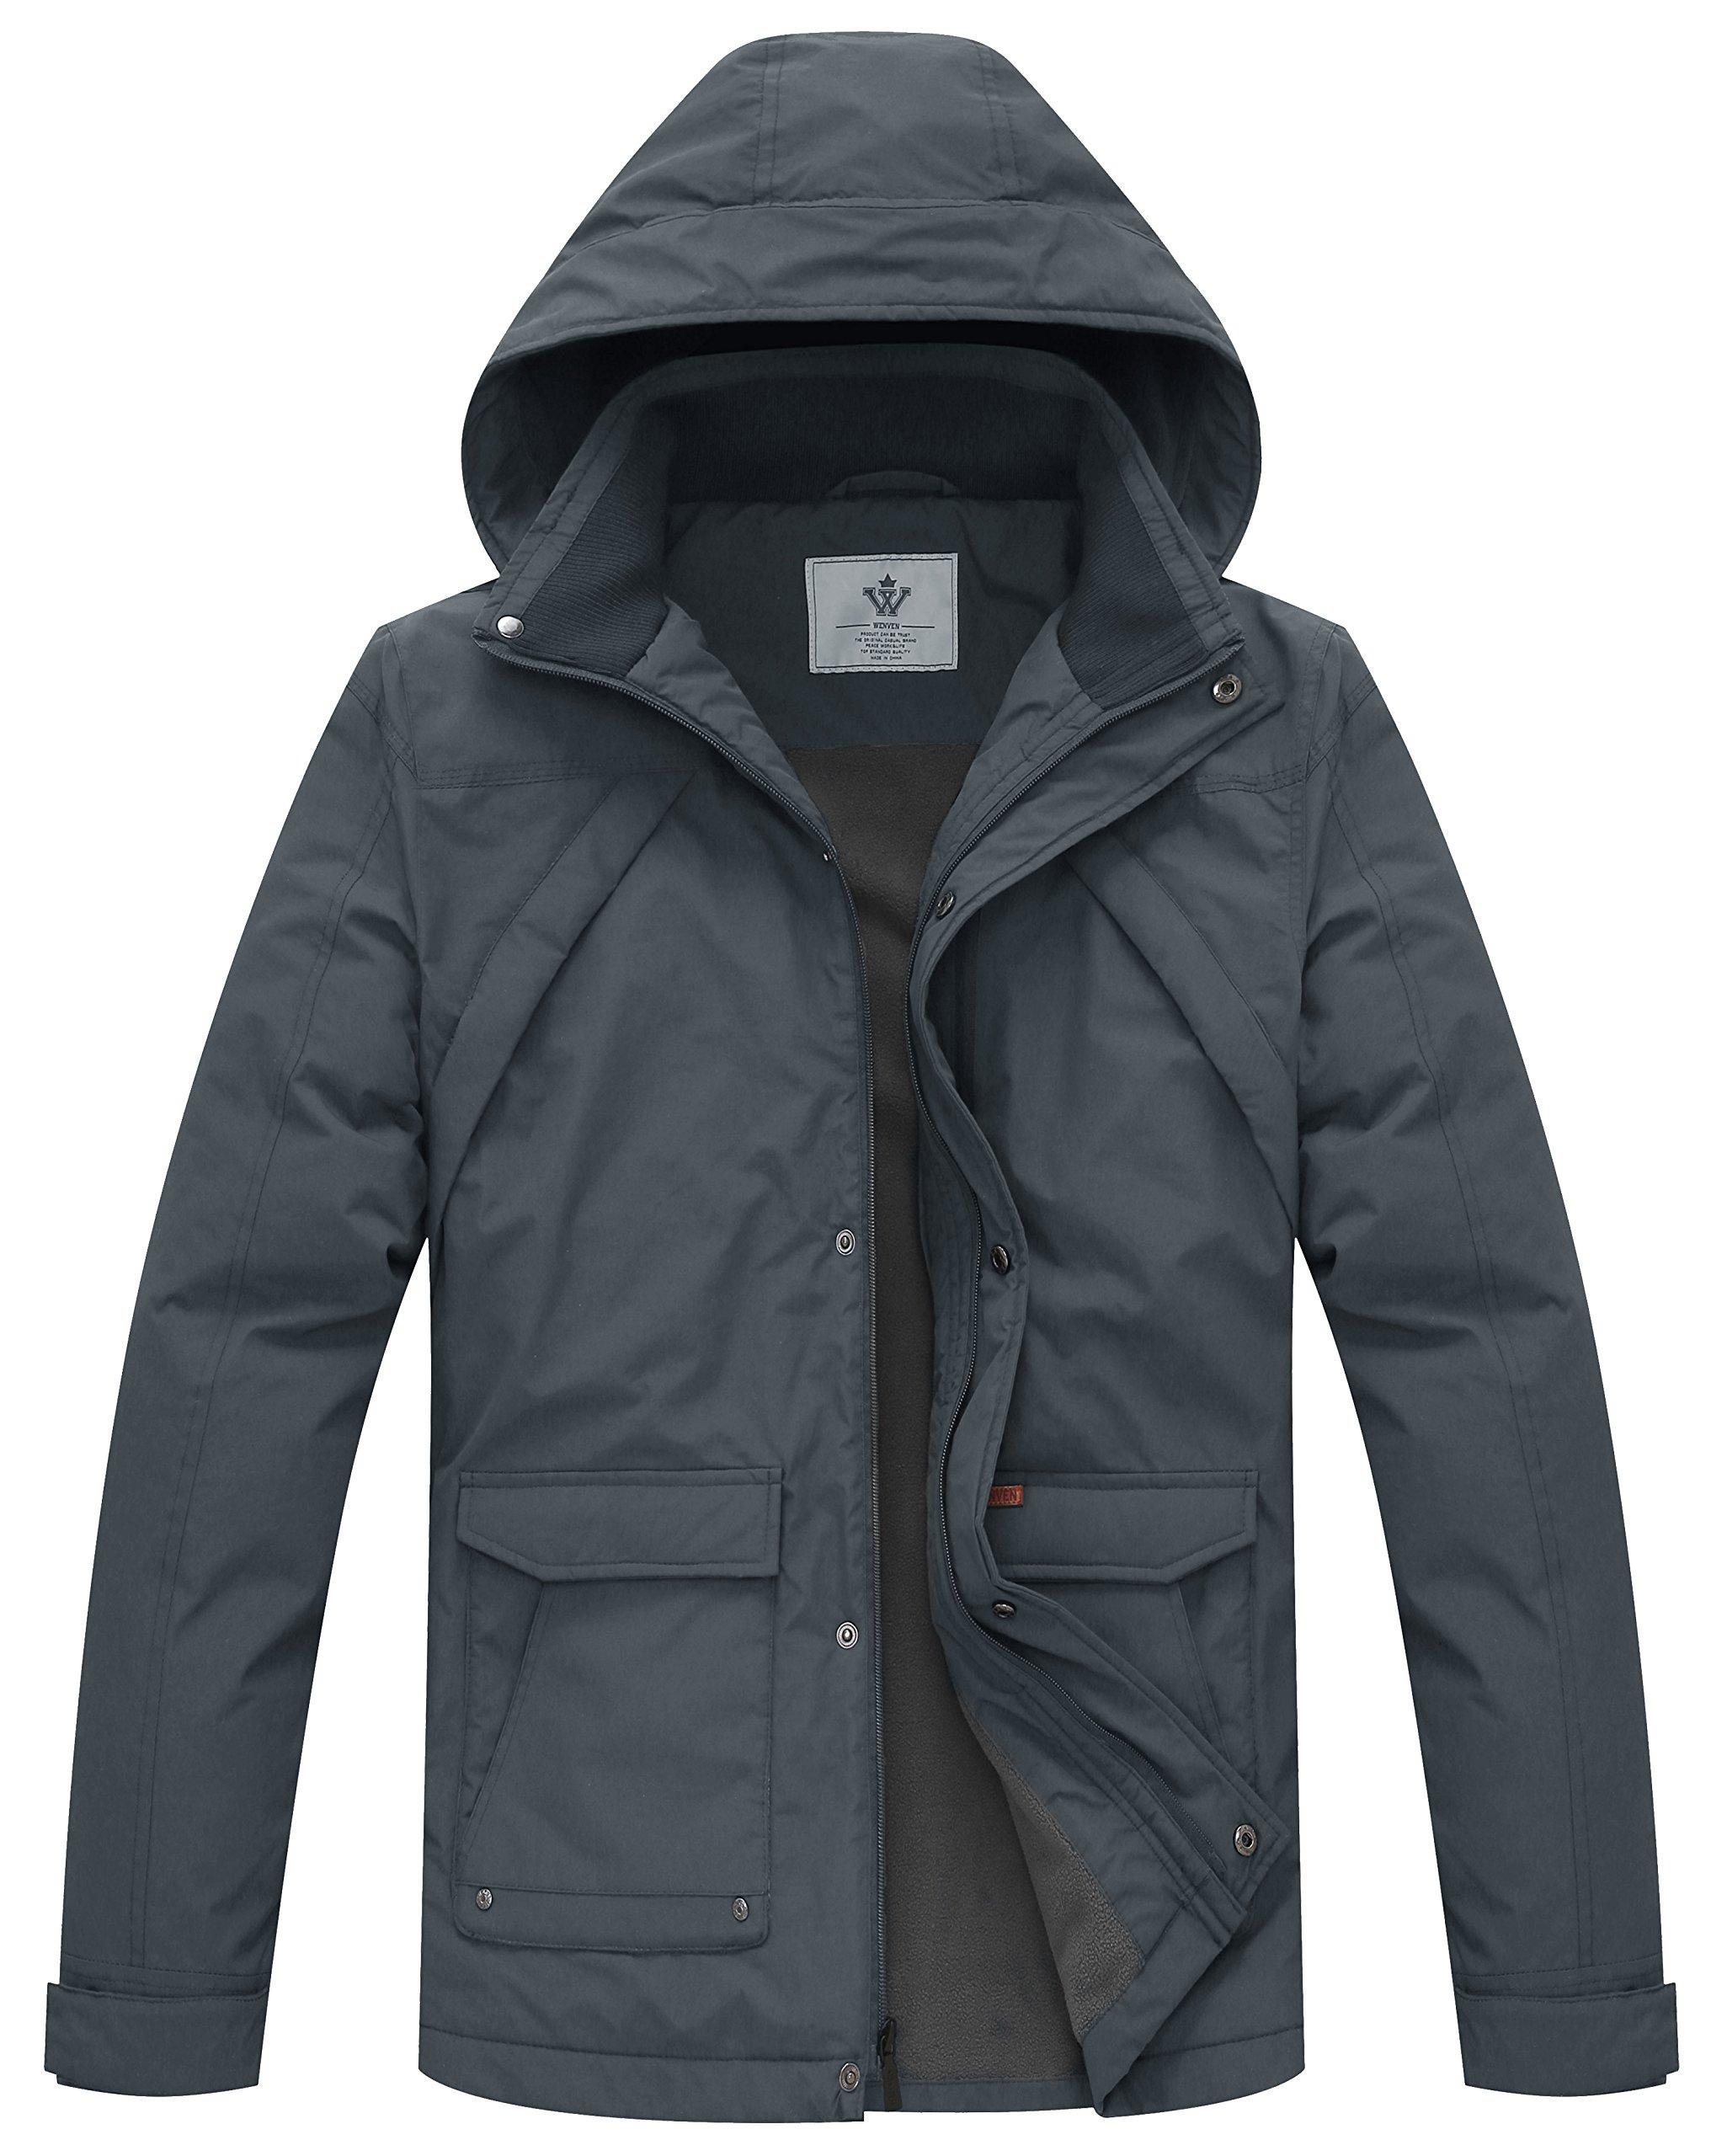 WenVen Men's Parka with Removable Hood(Grey,Large)